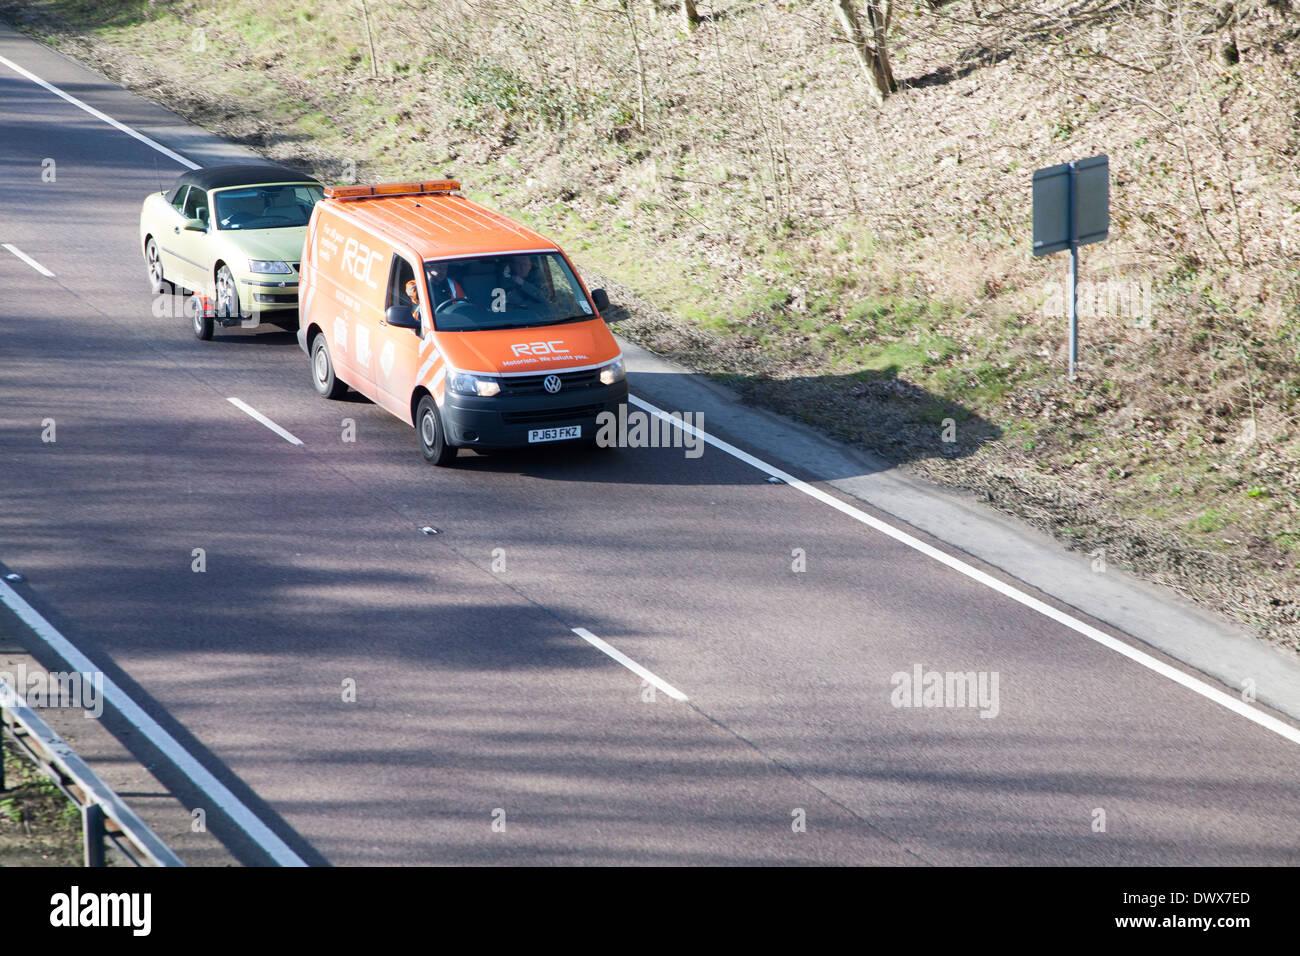 RAC breakdown service transporting broken down car, UK - Stock Image